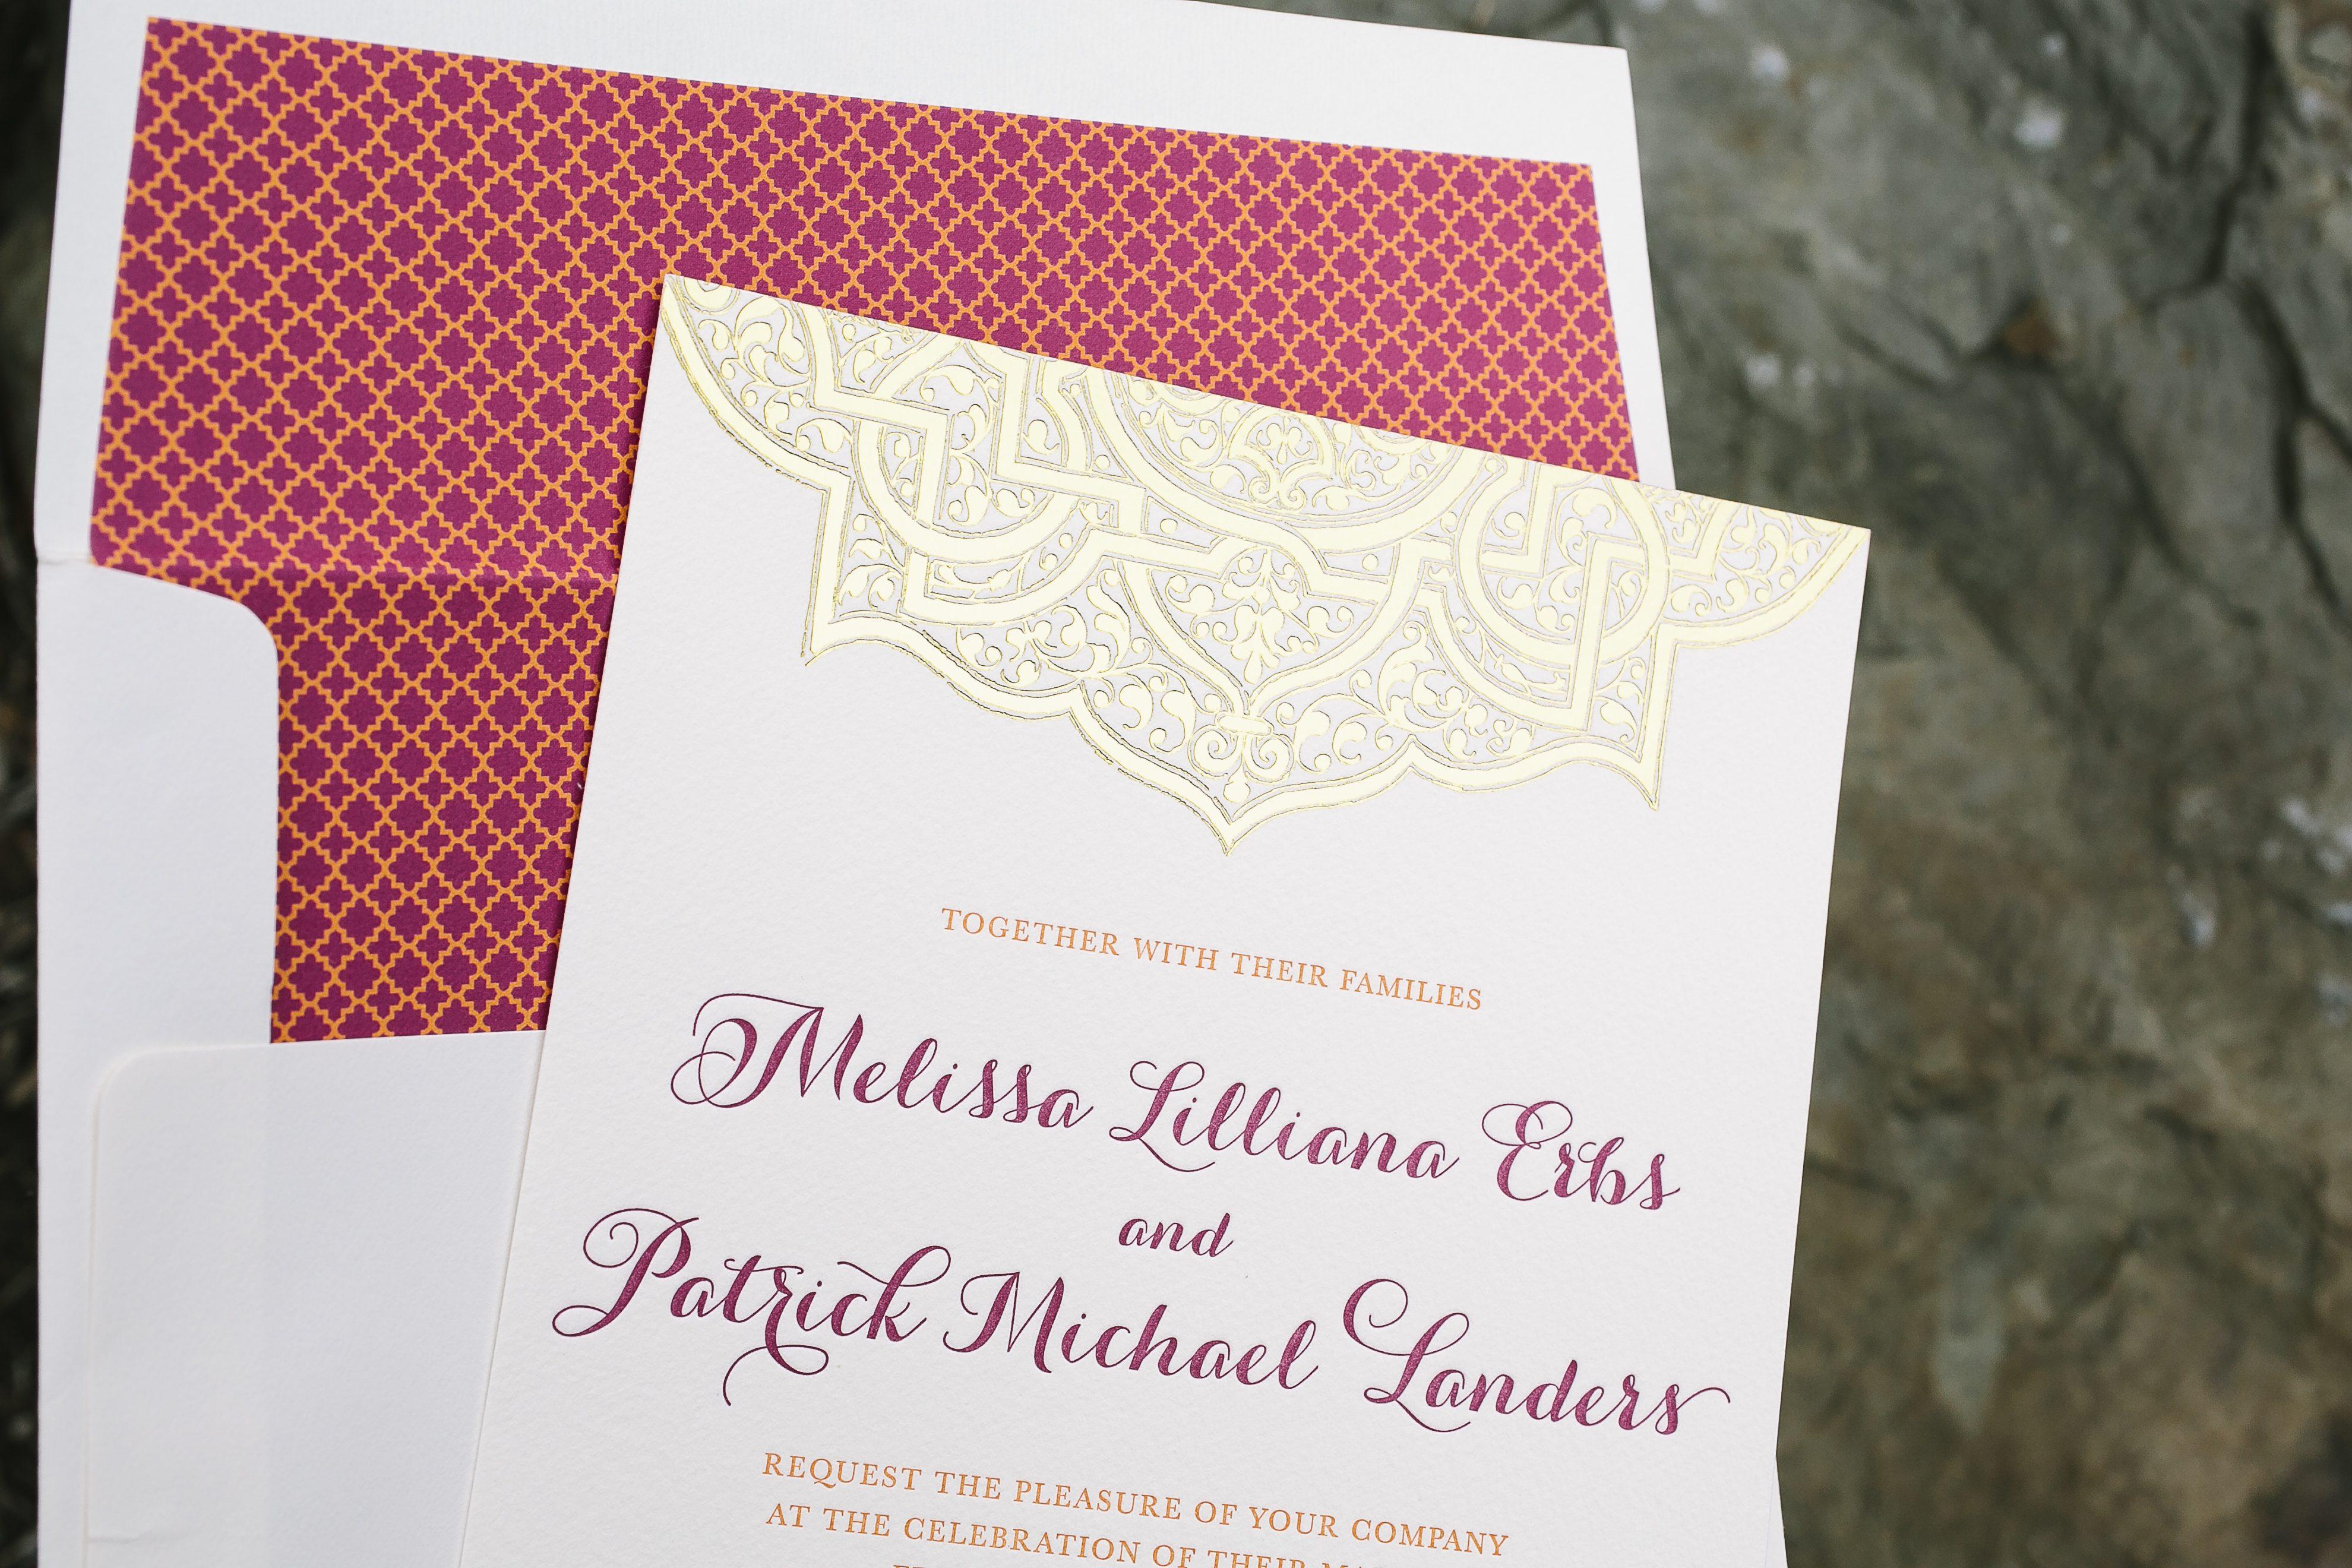 Mumbai Scrolls wedding invitations in gold foil - Bella Figura